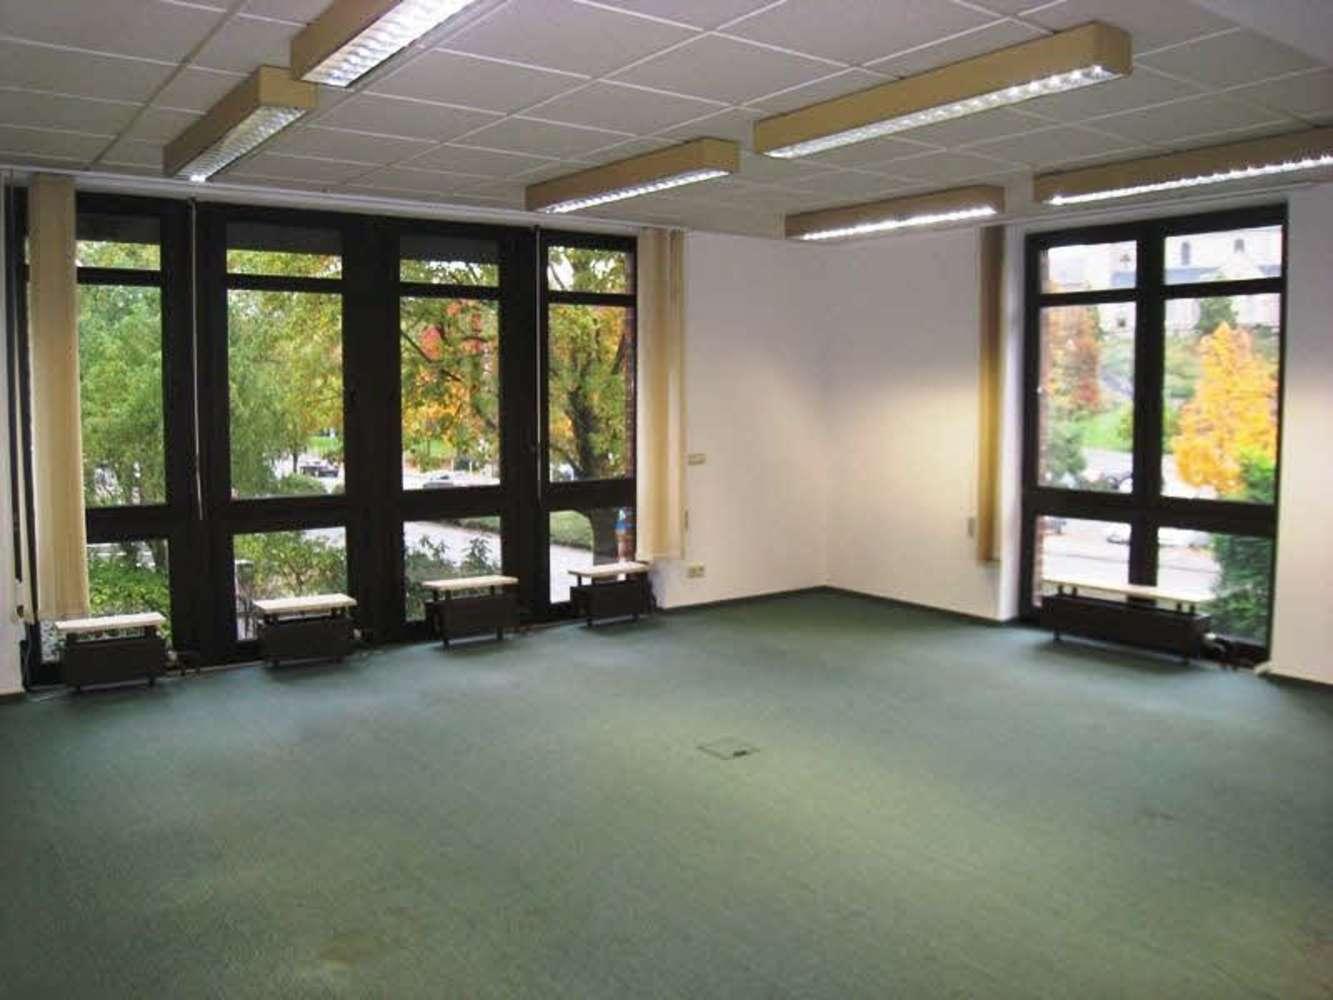 Büros Mönchengladbach, 41061 - Büro - Mönchengladbach, Stadtmitte - D2209 - 9504616